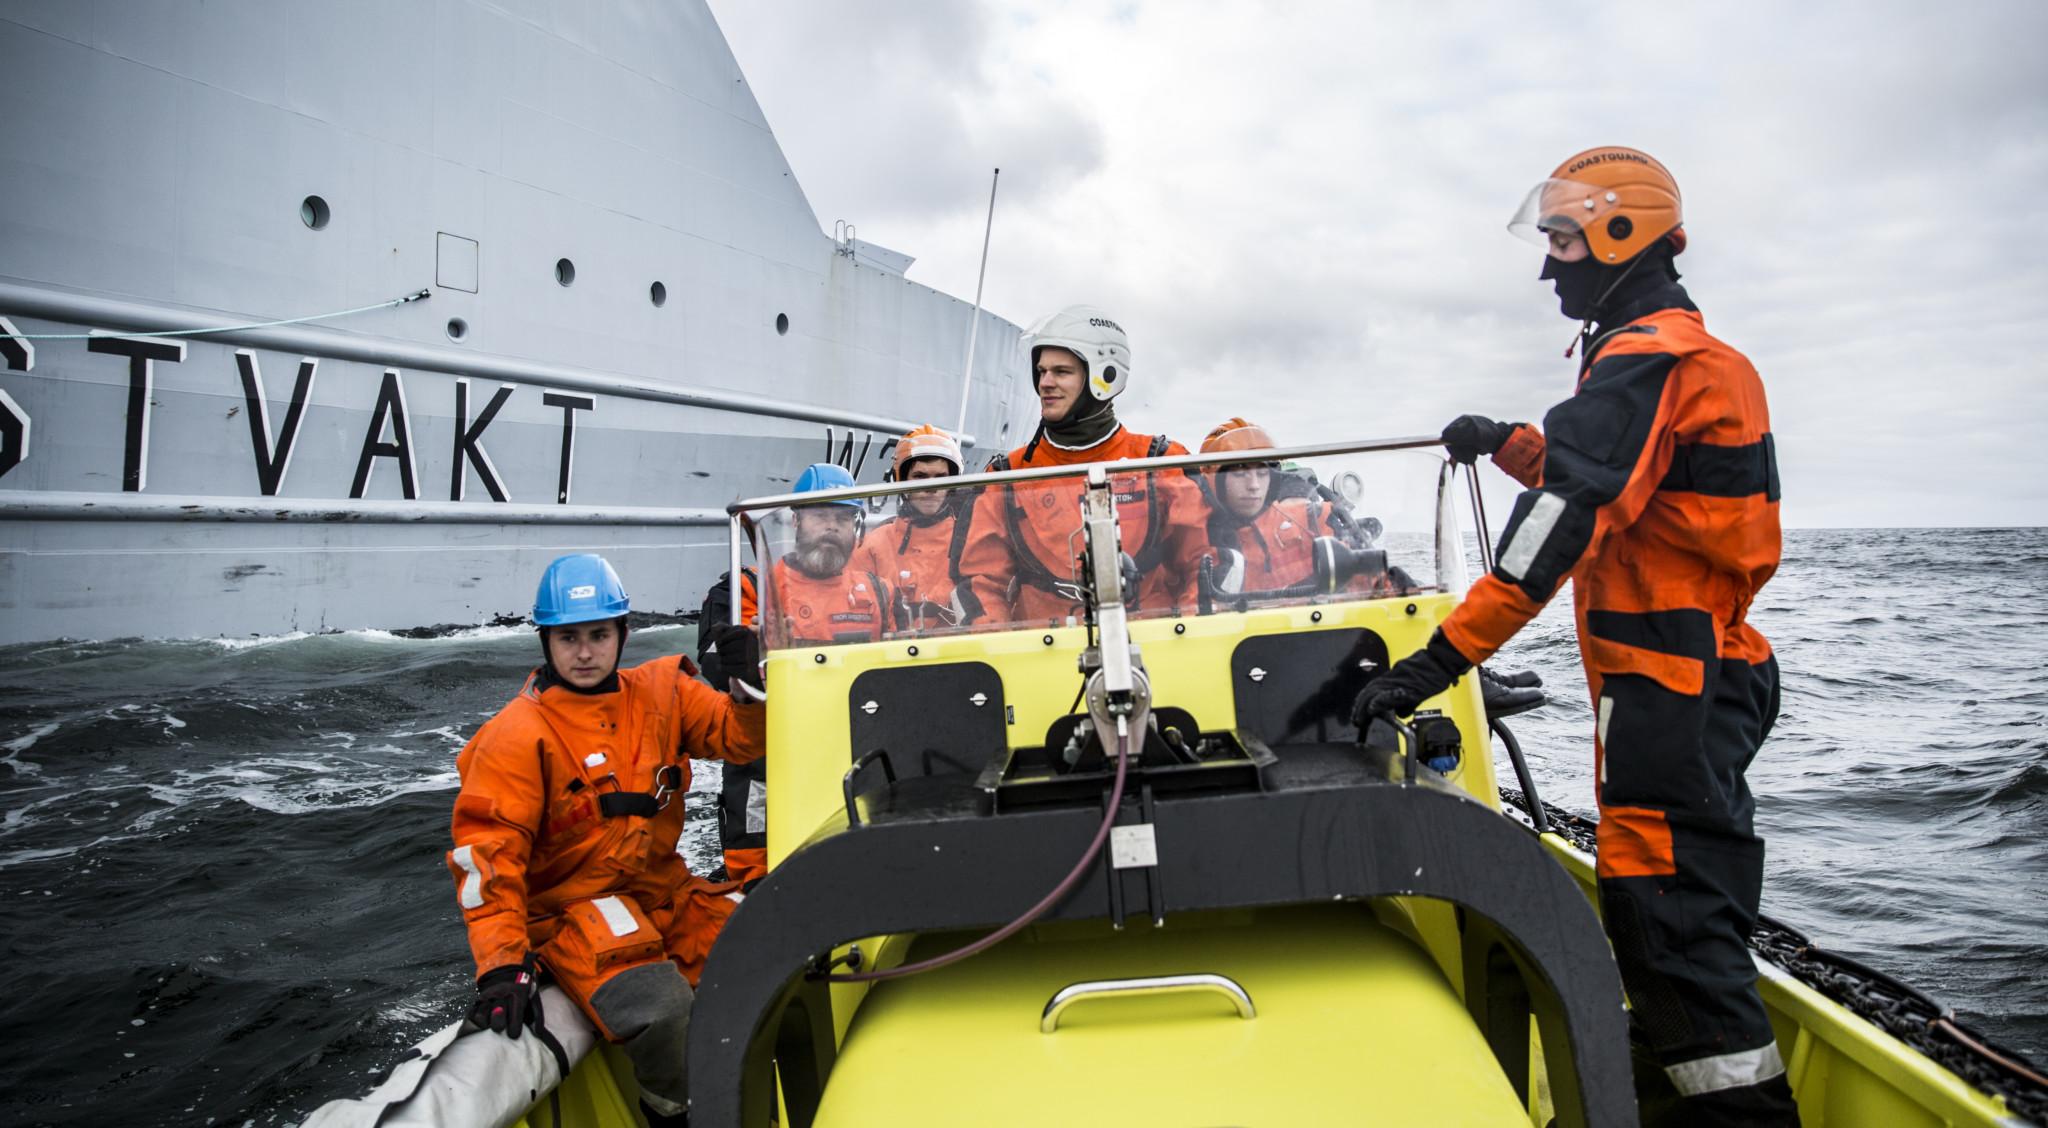 Frykter store sambandsproblemer til havs